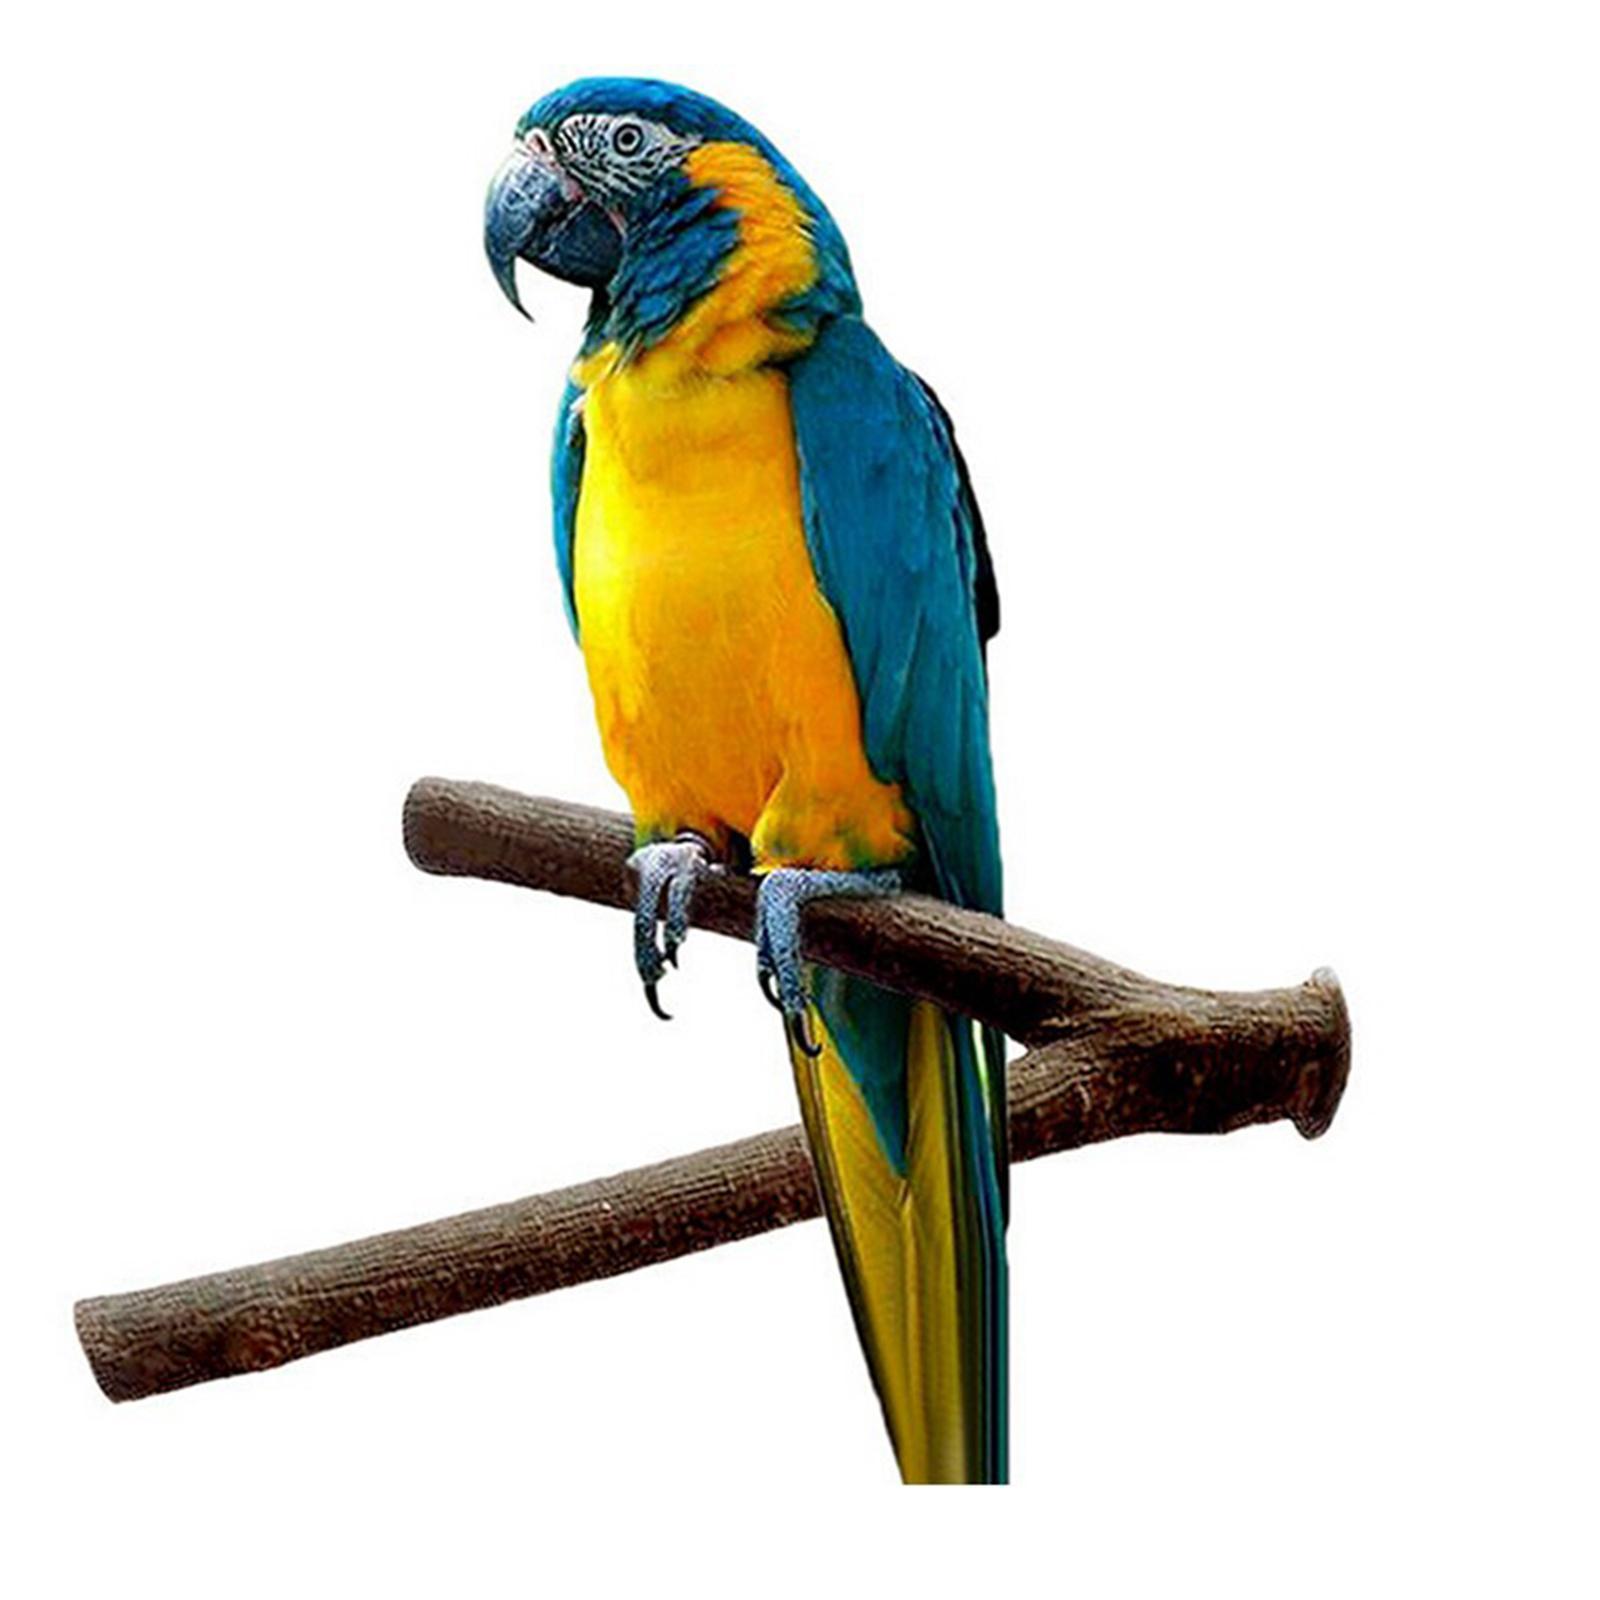 thumbnail 37 - Bird-Perch-Wood-Stand-Bird-Cage-Swing-Branch-for-Parrot-Parakeet-Cockatiel